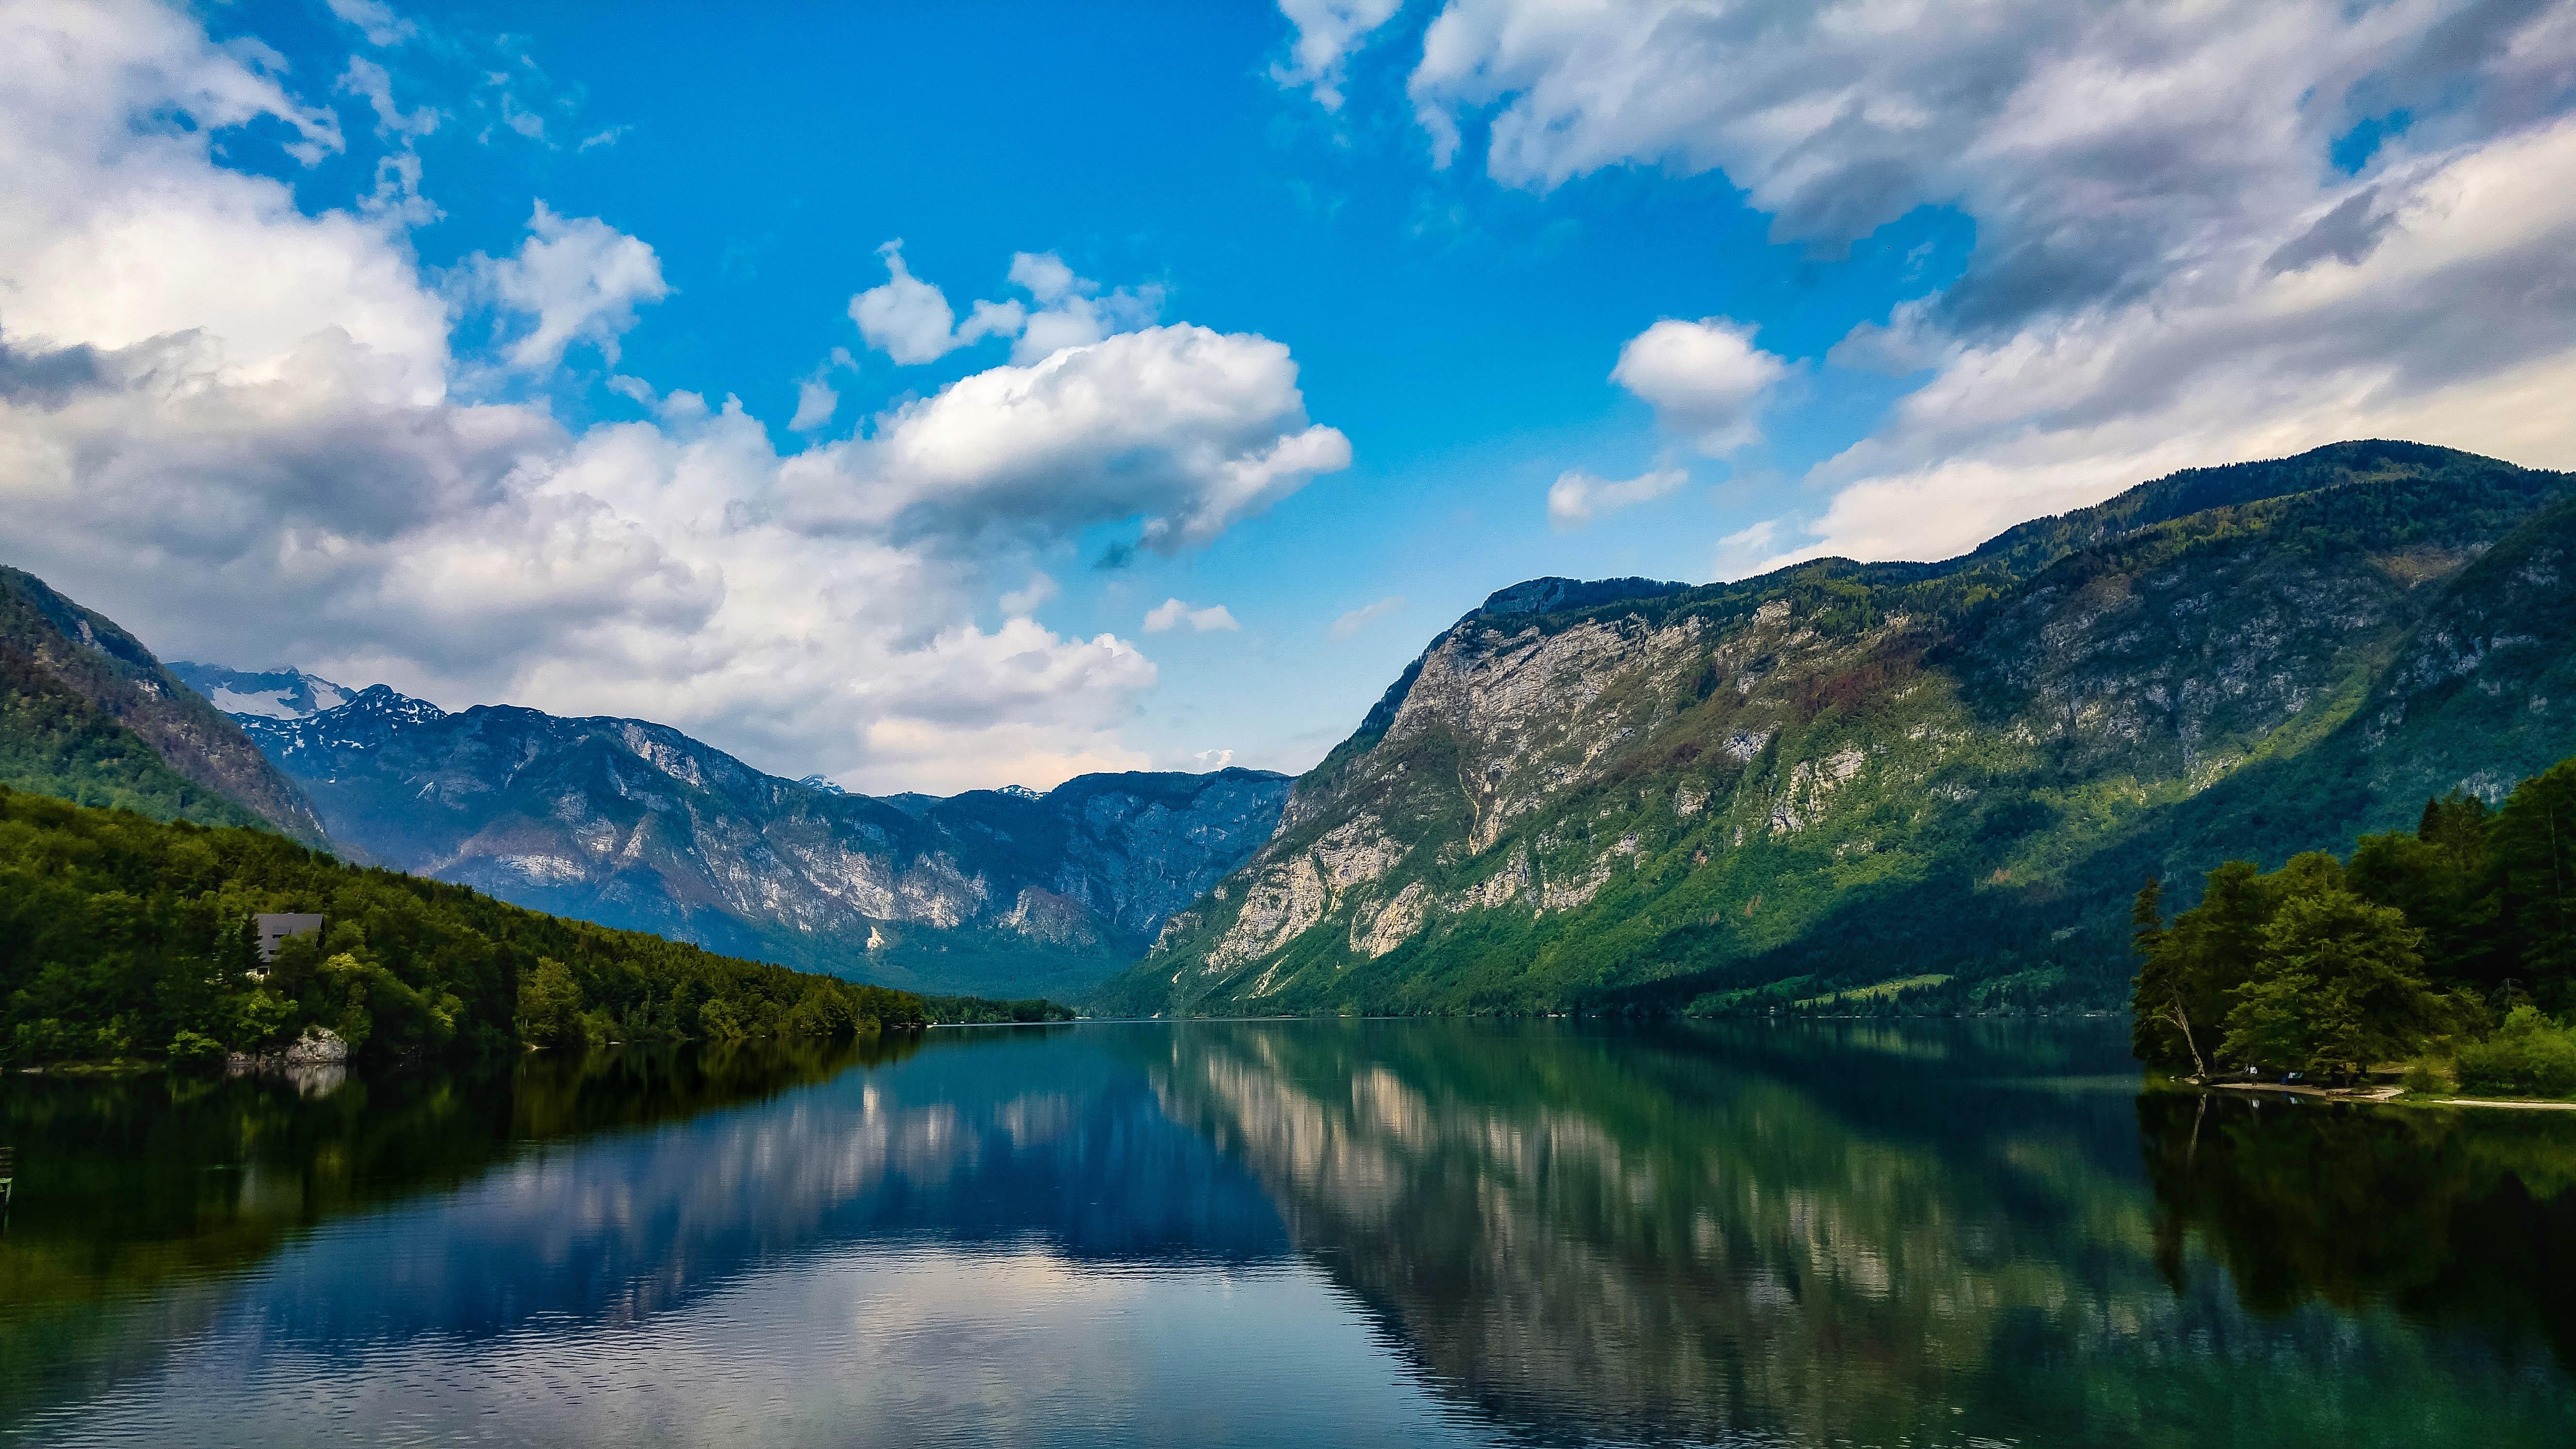 amazing-lake-in-mountains-idyllic-alpine-landscape-QWV98BX